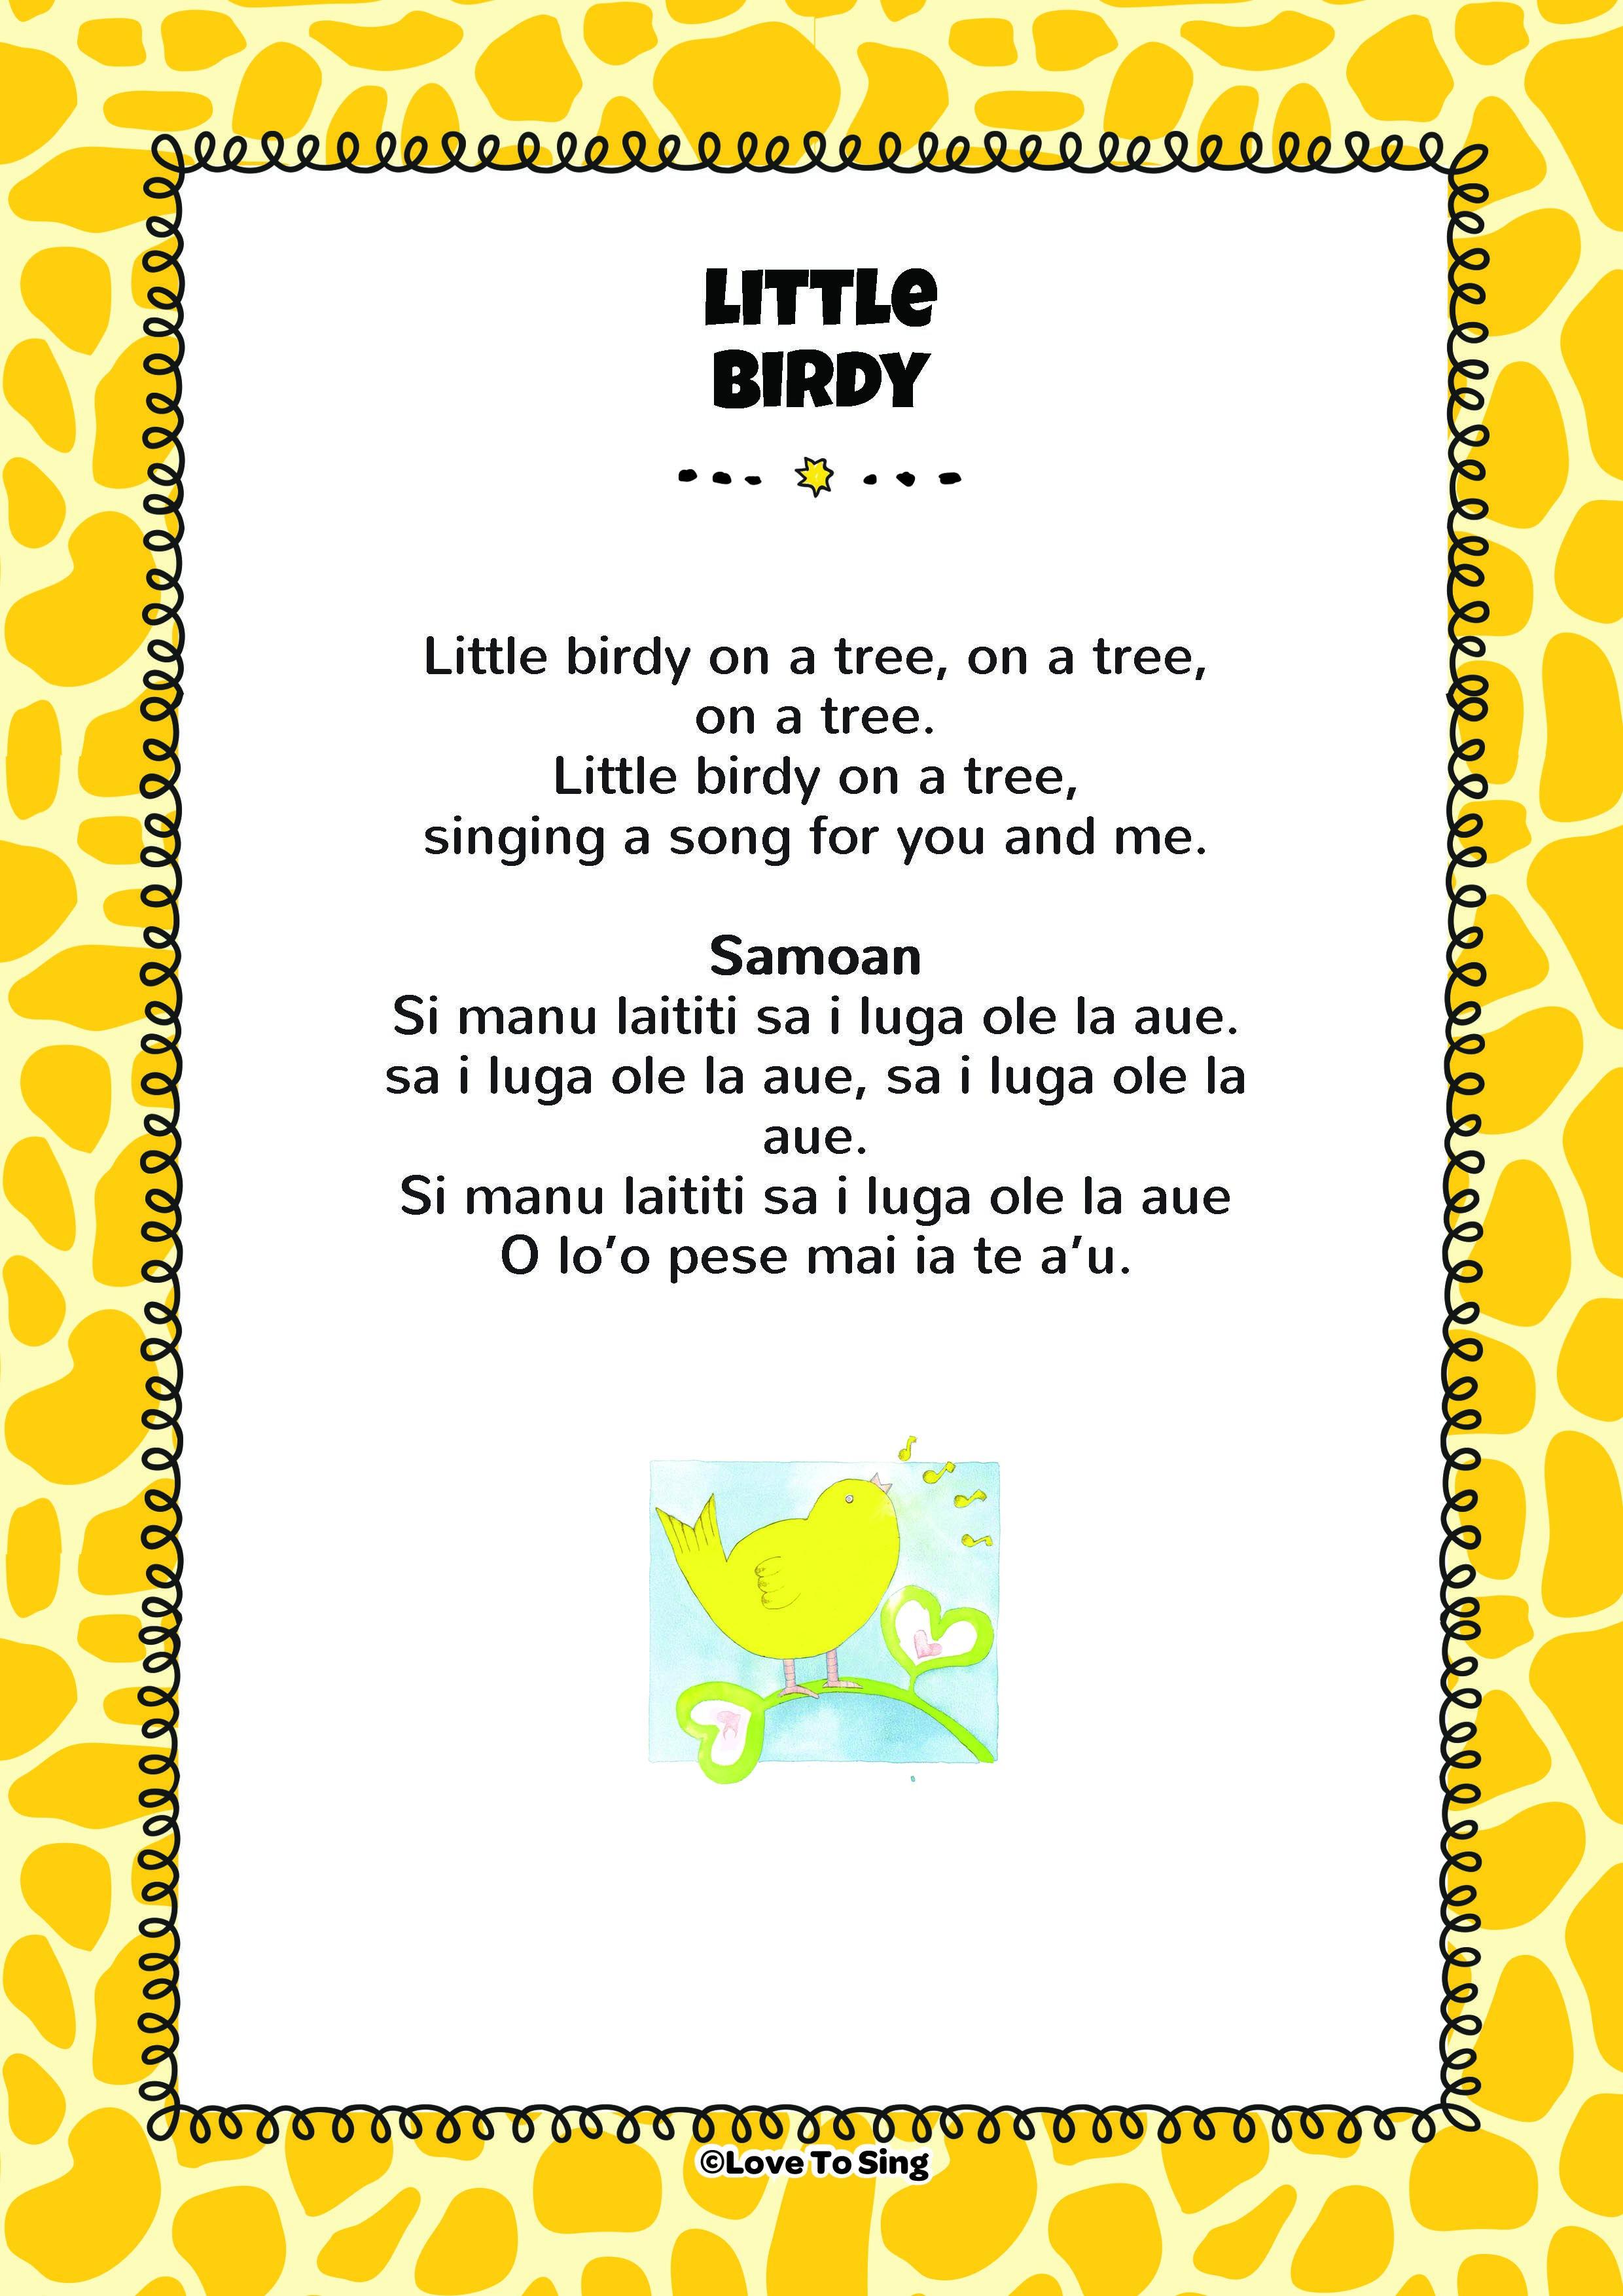 Little Birdy on a Tree Free lyrics, Kids video songs